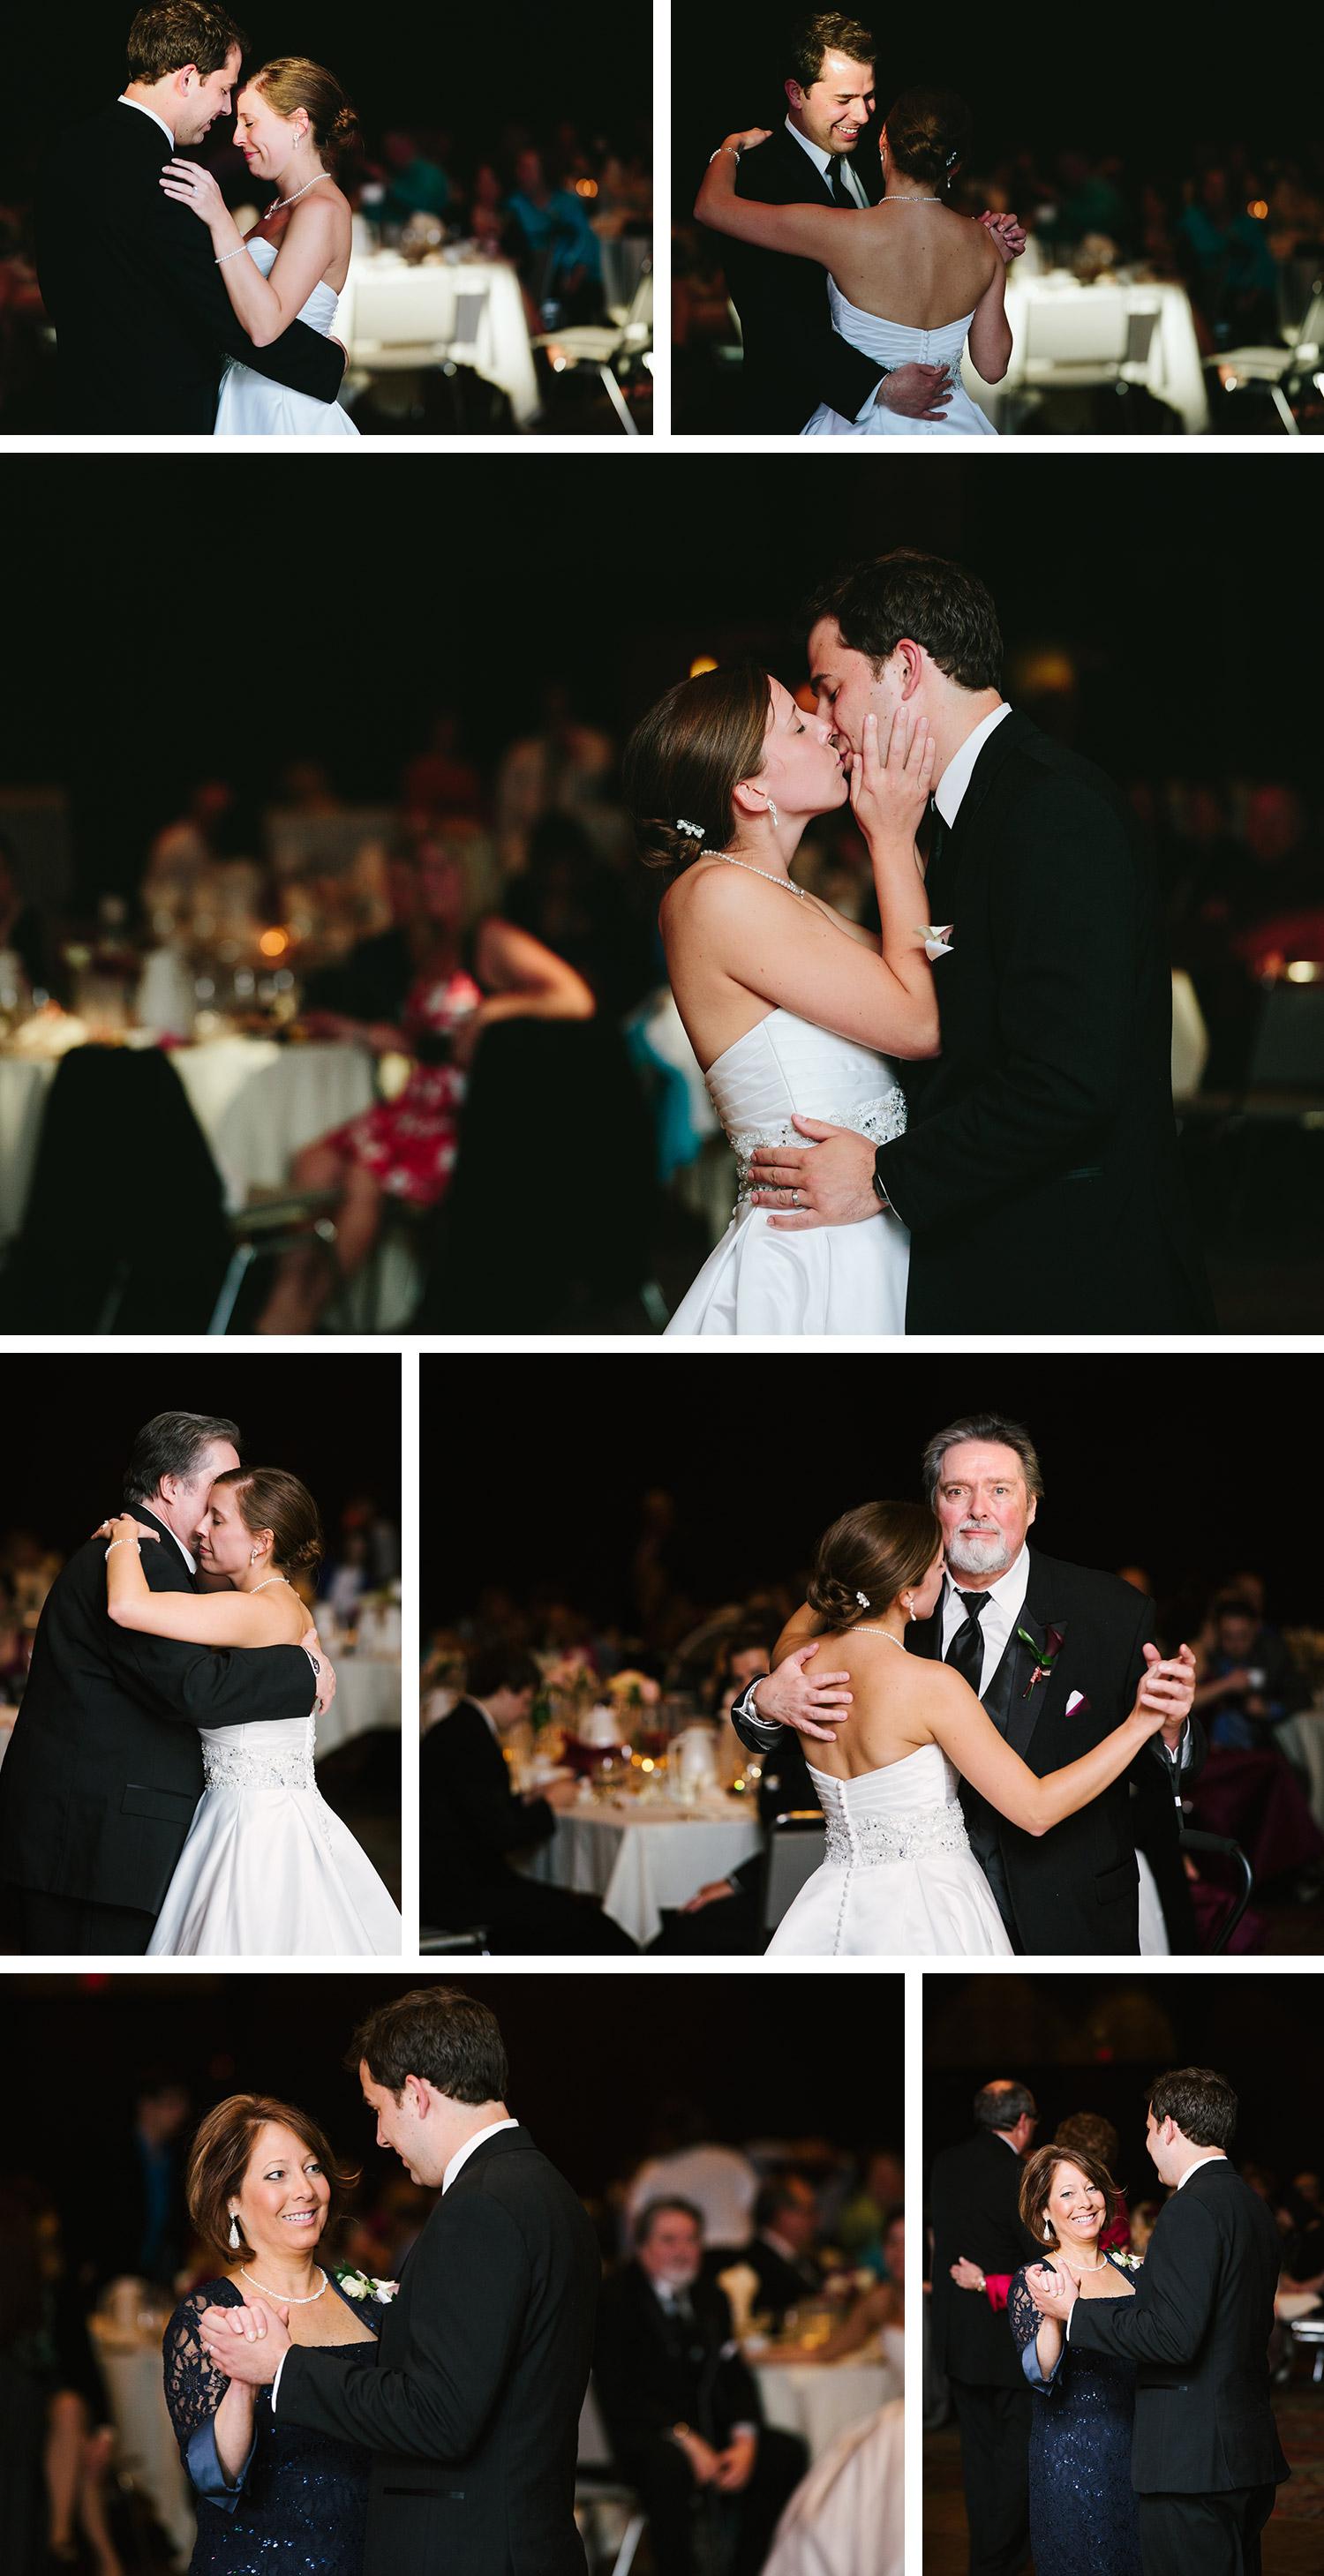 Duluth DECC wedding dance images on Lake Superior